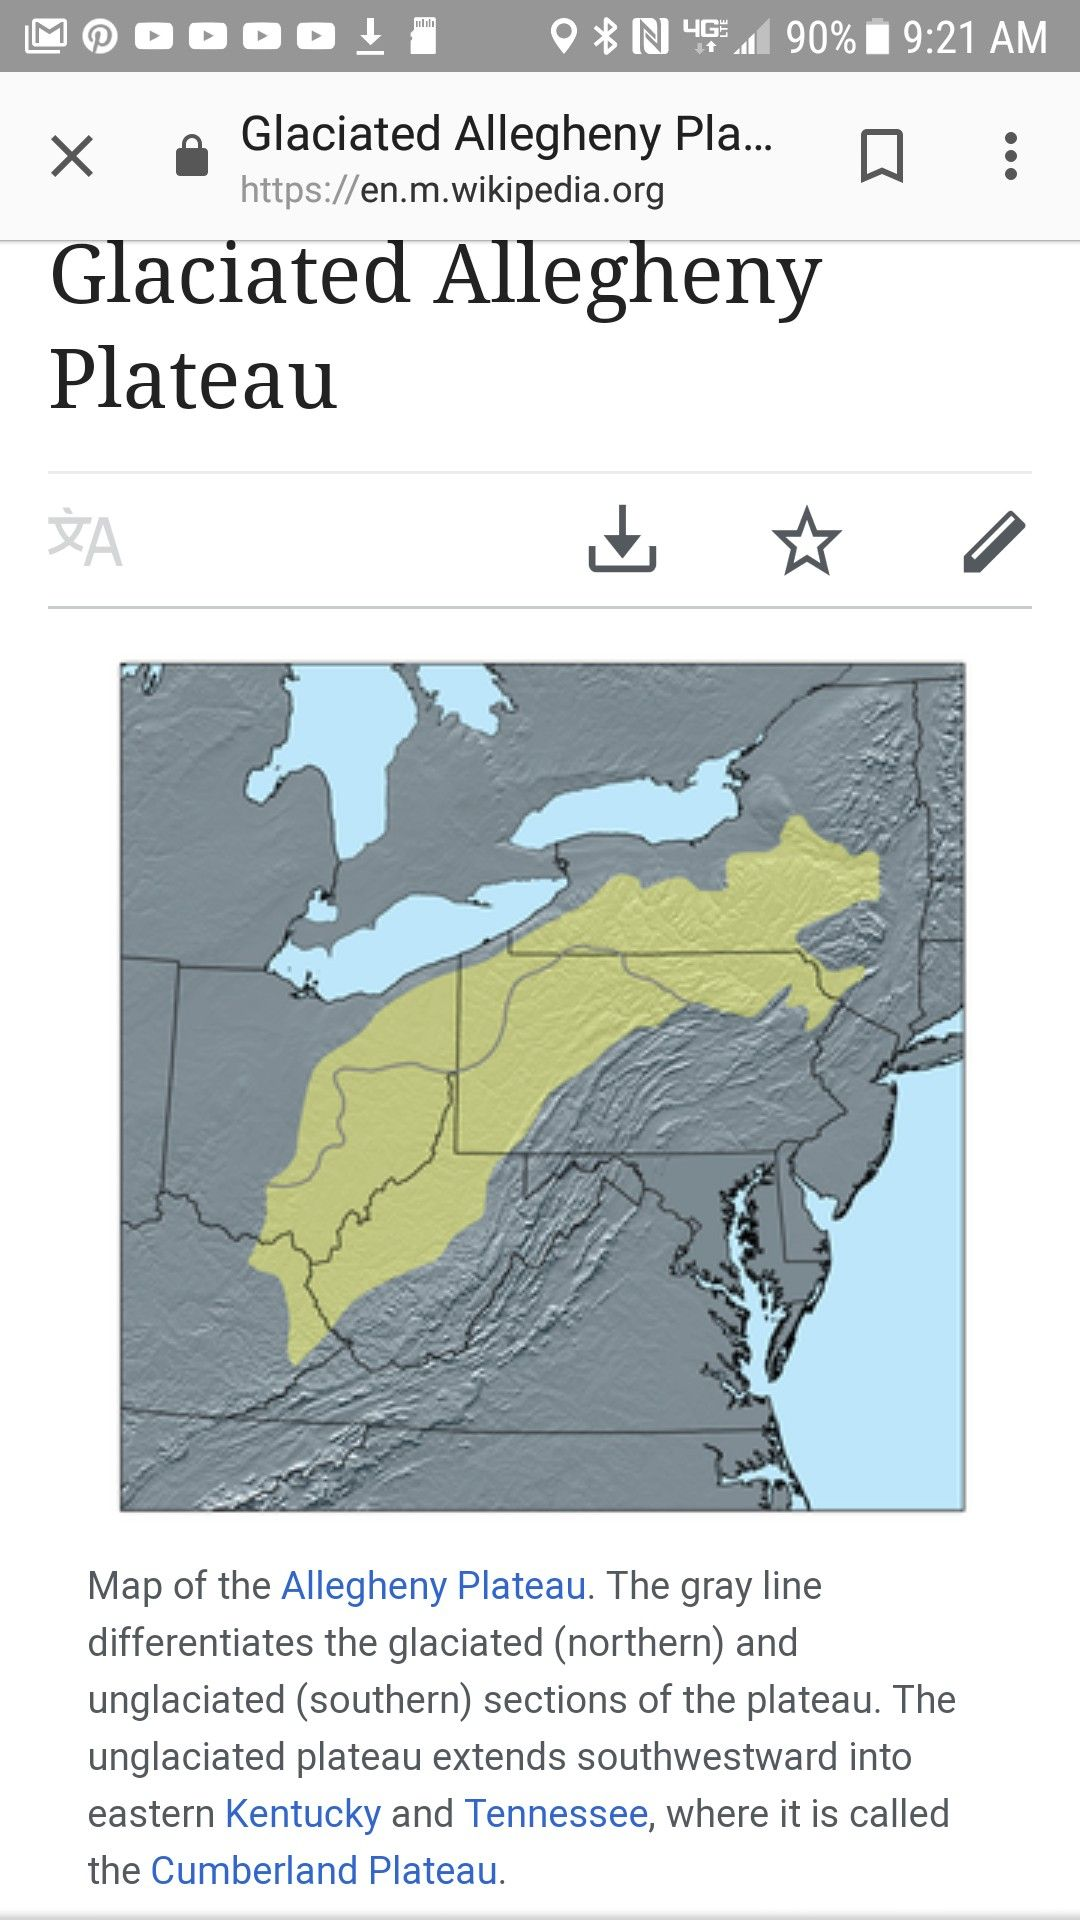 Glaciated Allegheny plateau | Cumberland plateau, Kentucky, Map